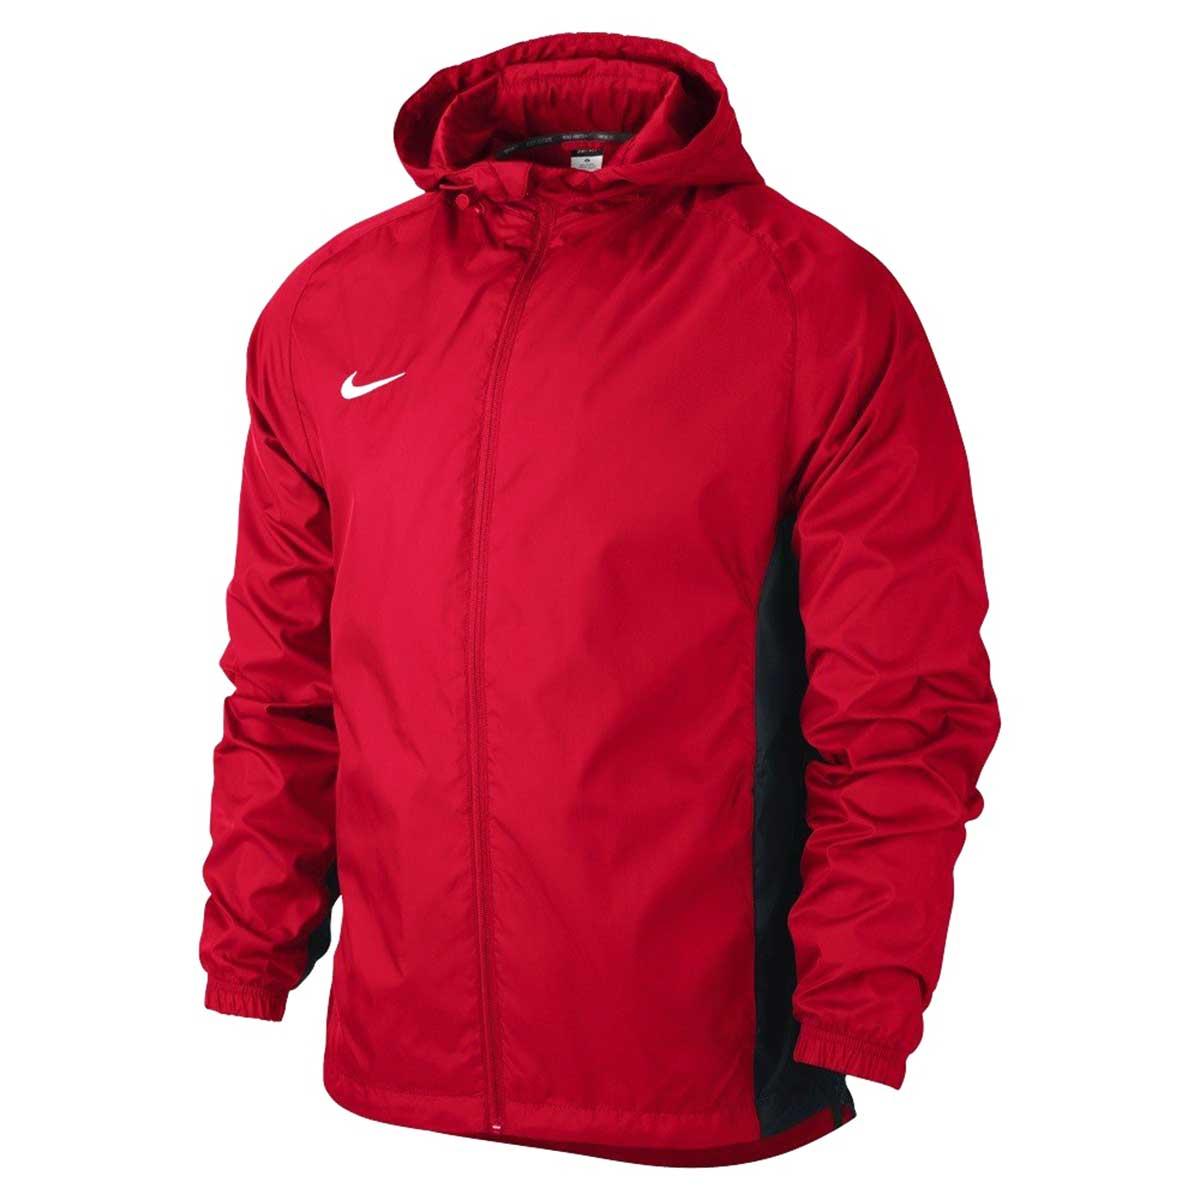 Jackets, Men's Sportswear, Clothing, Buy, Nike, Nike Academy Rain Jacket  (Red)